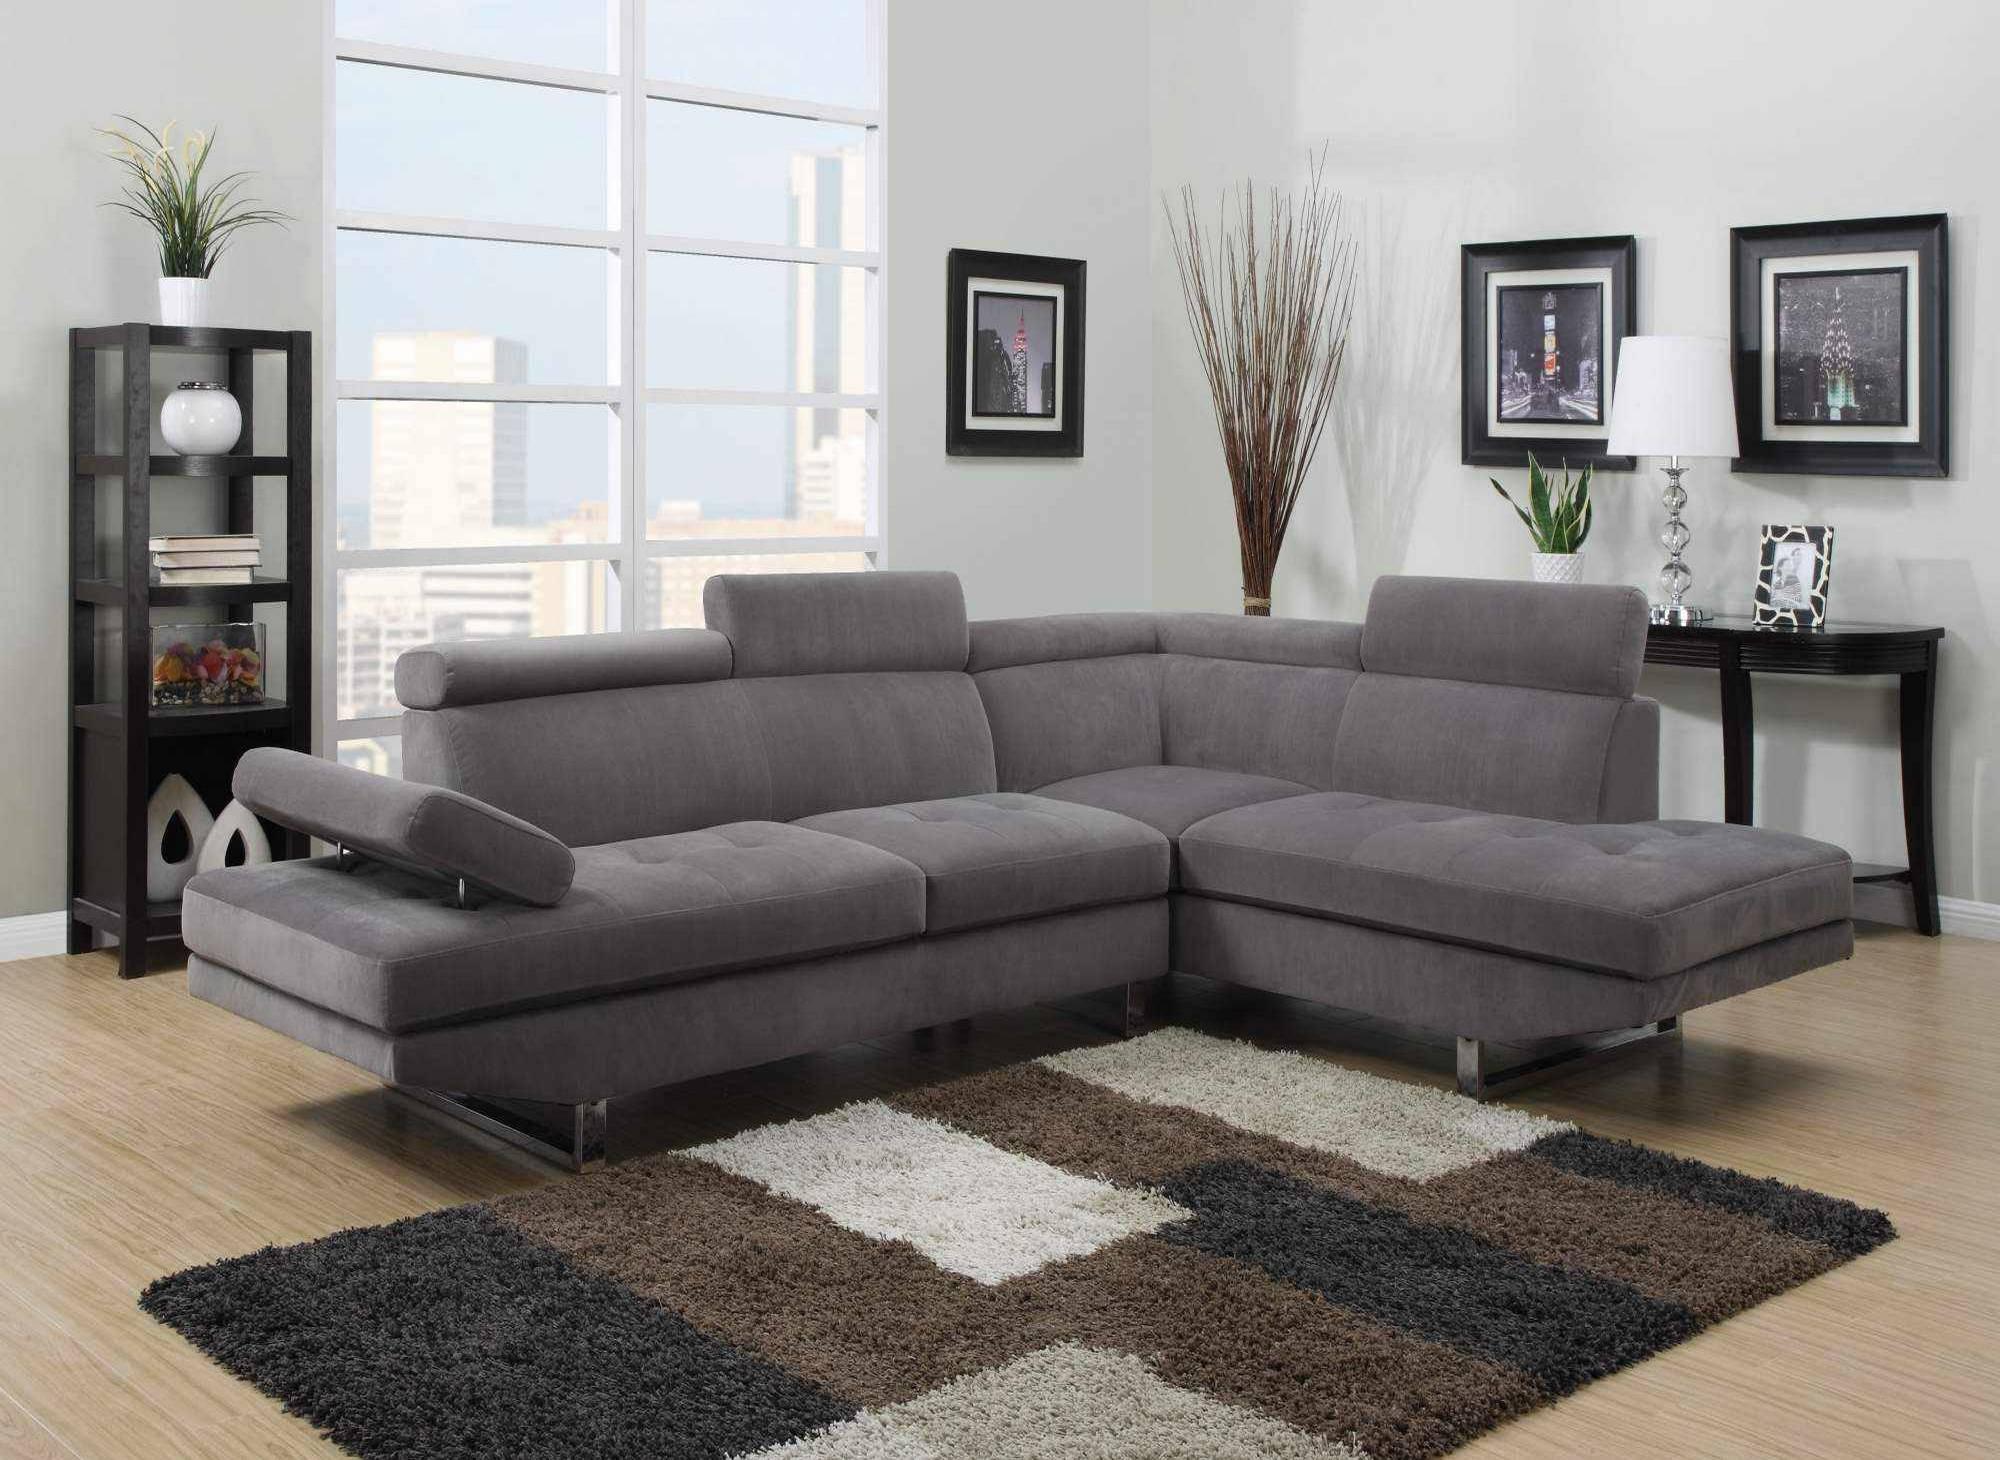 Canapé d'angle design gris RUBIC - Angle Droit